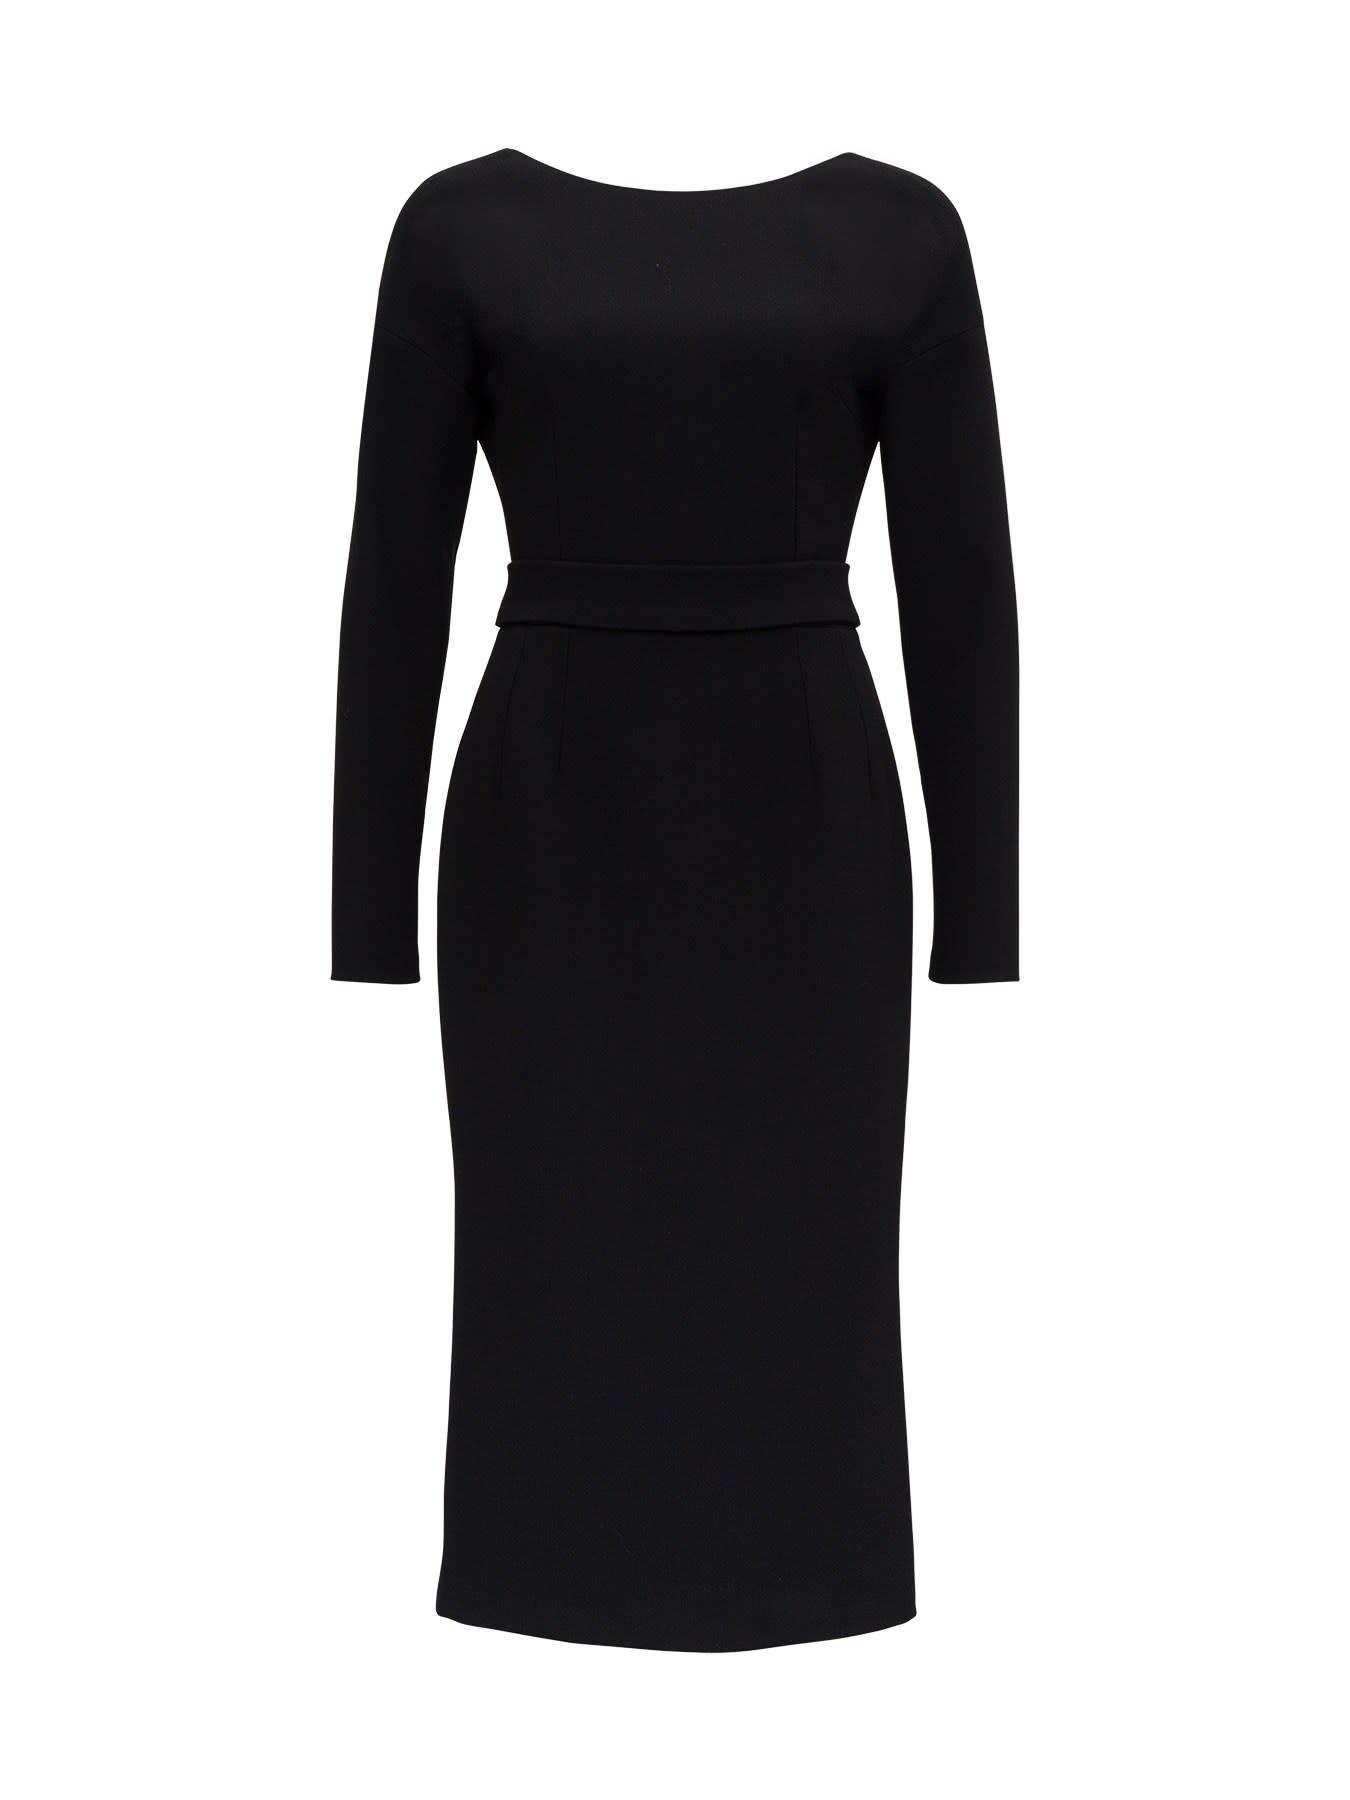 Buy Dolce & Gabbana Crepe Midi Dress online, shop Dolce & Gabbana with free shipping